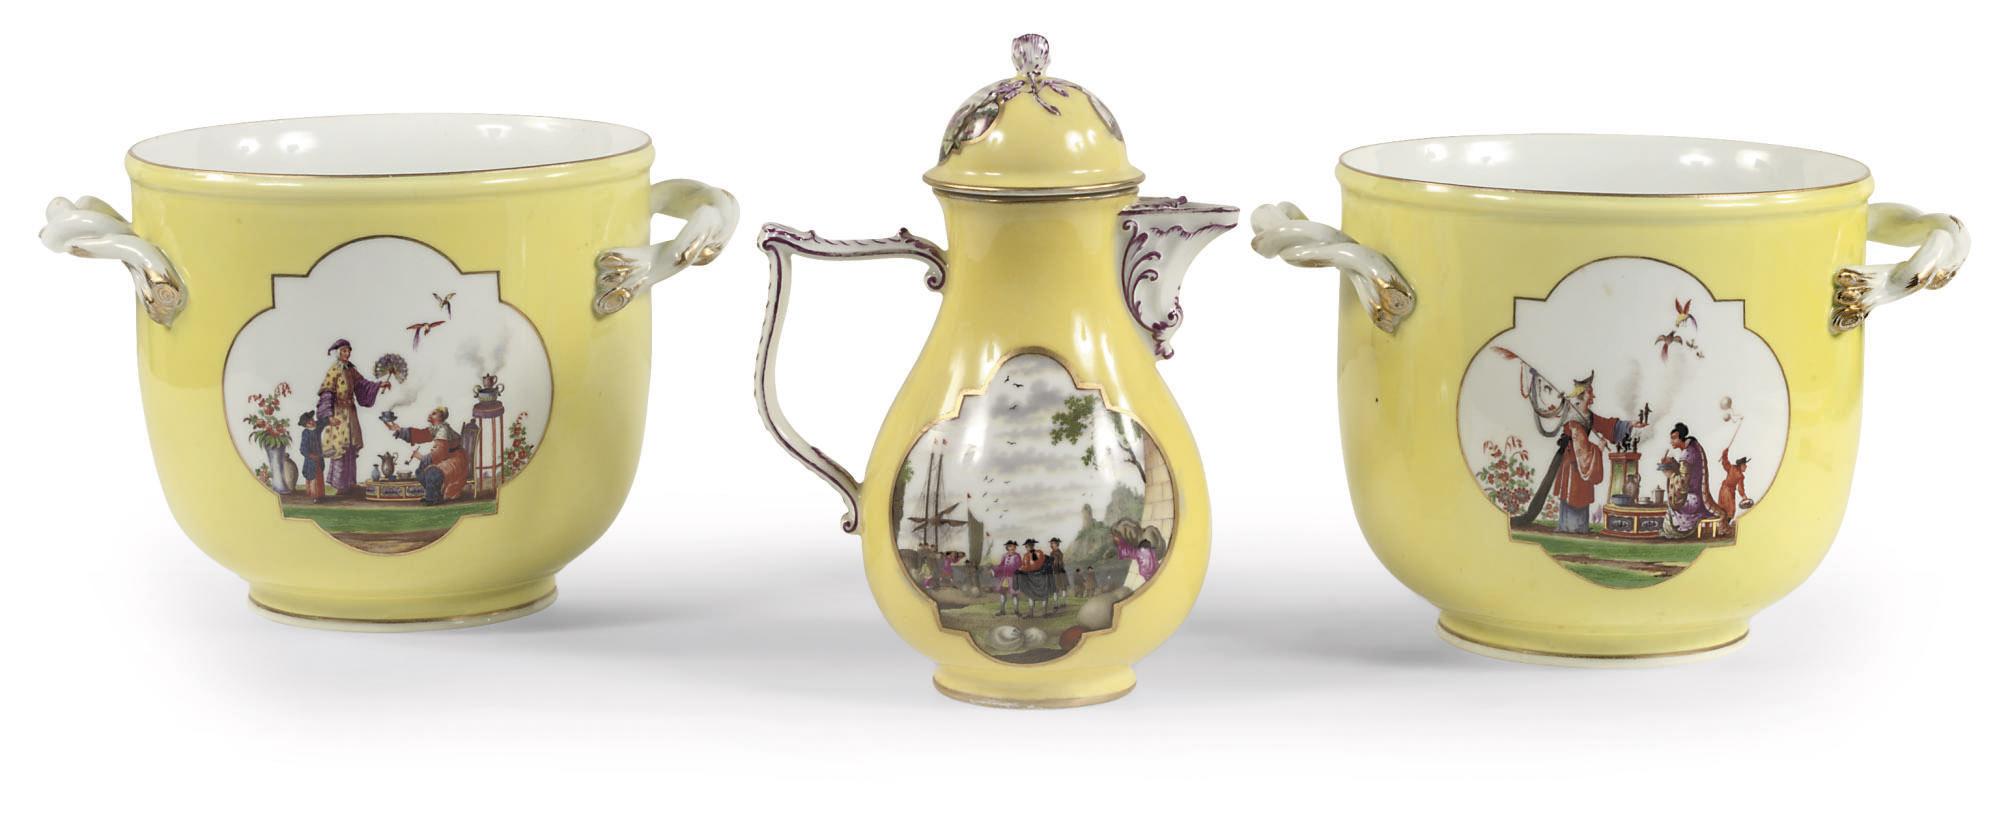 A Meissen porcelain yellow gro